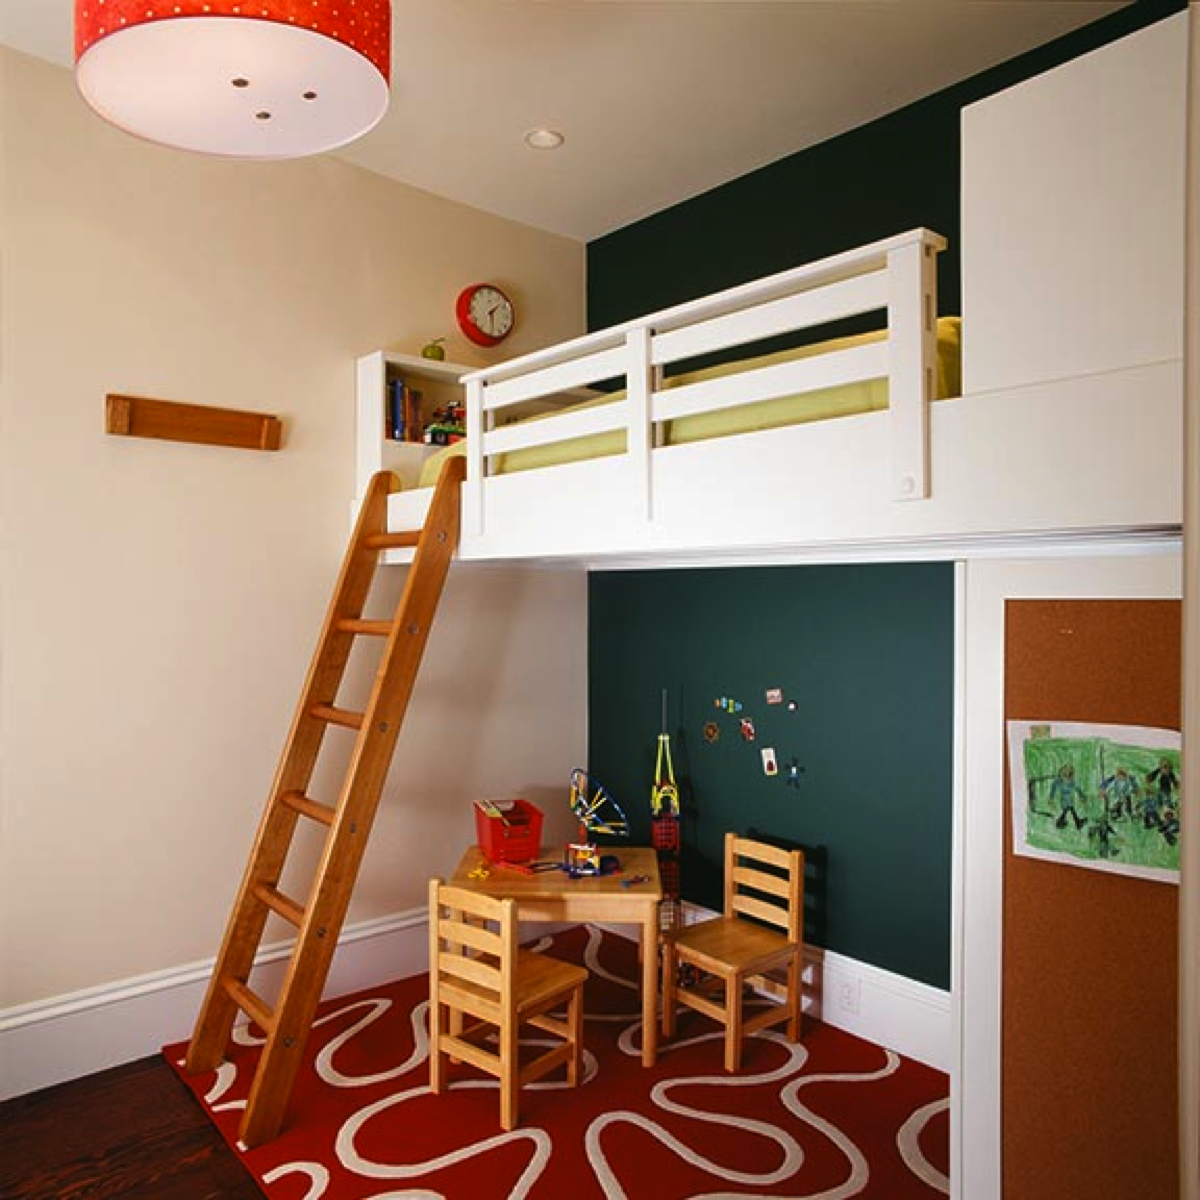 Loft bed with desk for small room  Mezzanine  Kids  Pinterest  Mezzanine Loft room and Big girl rooms